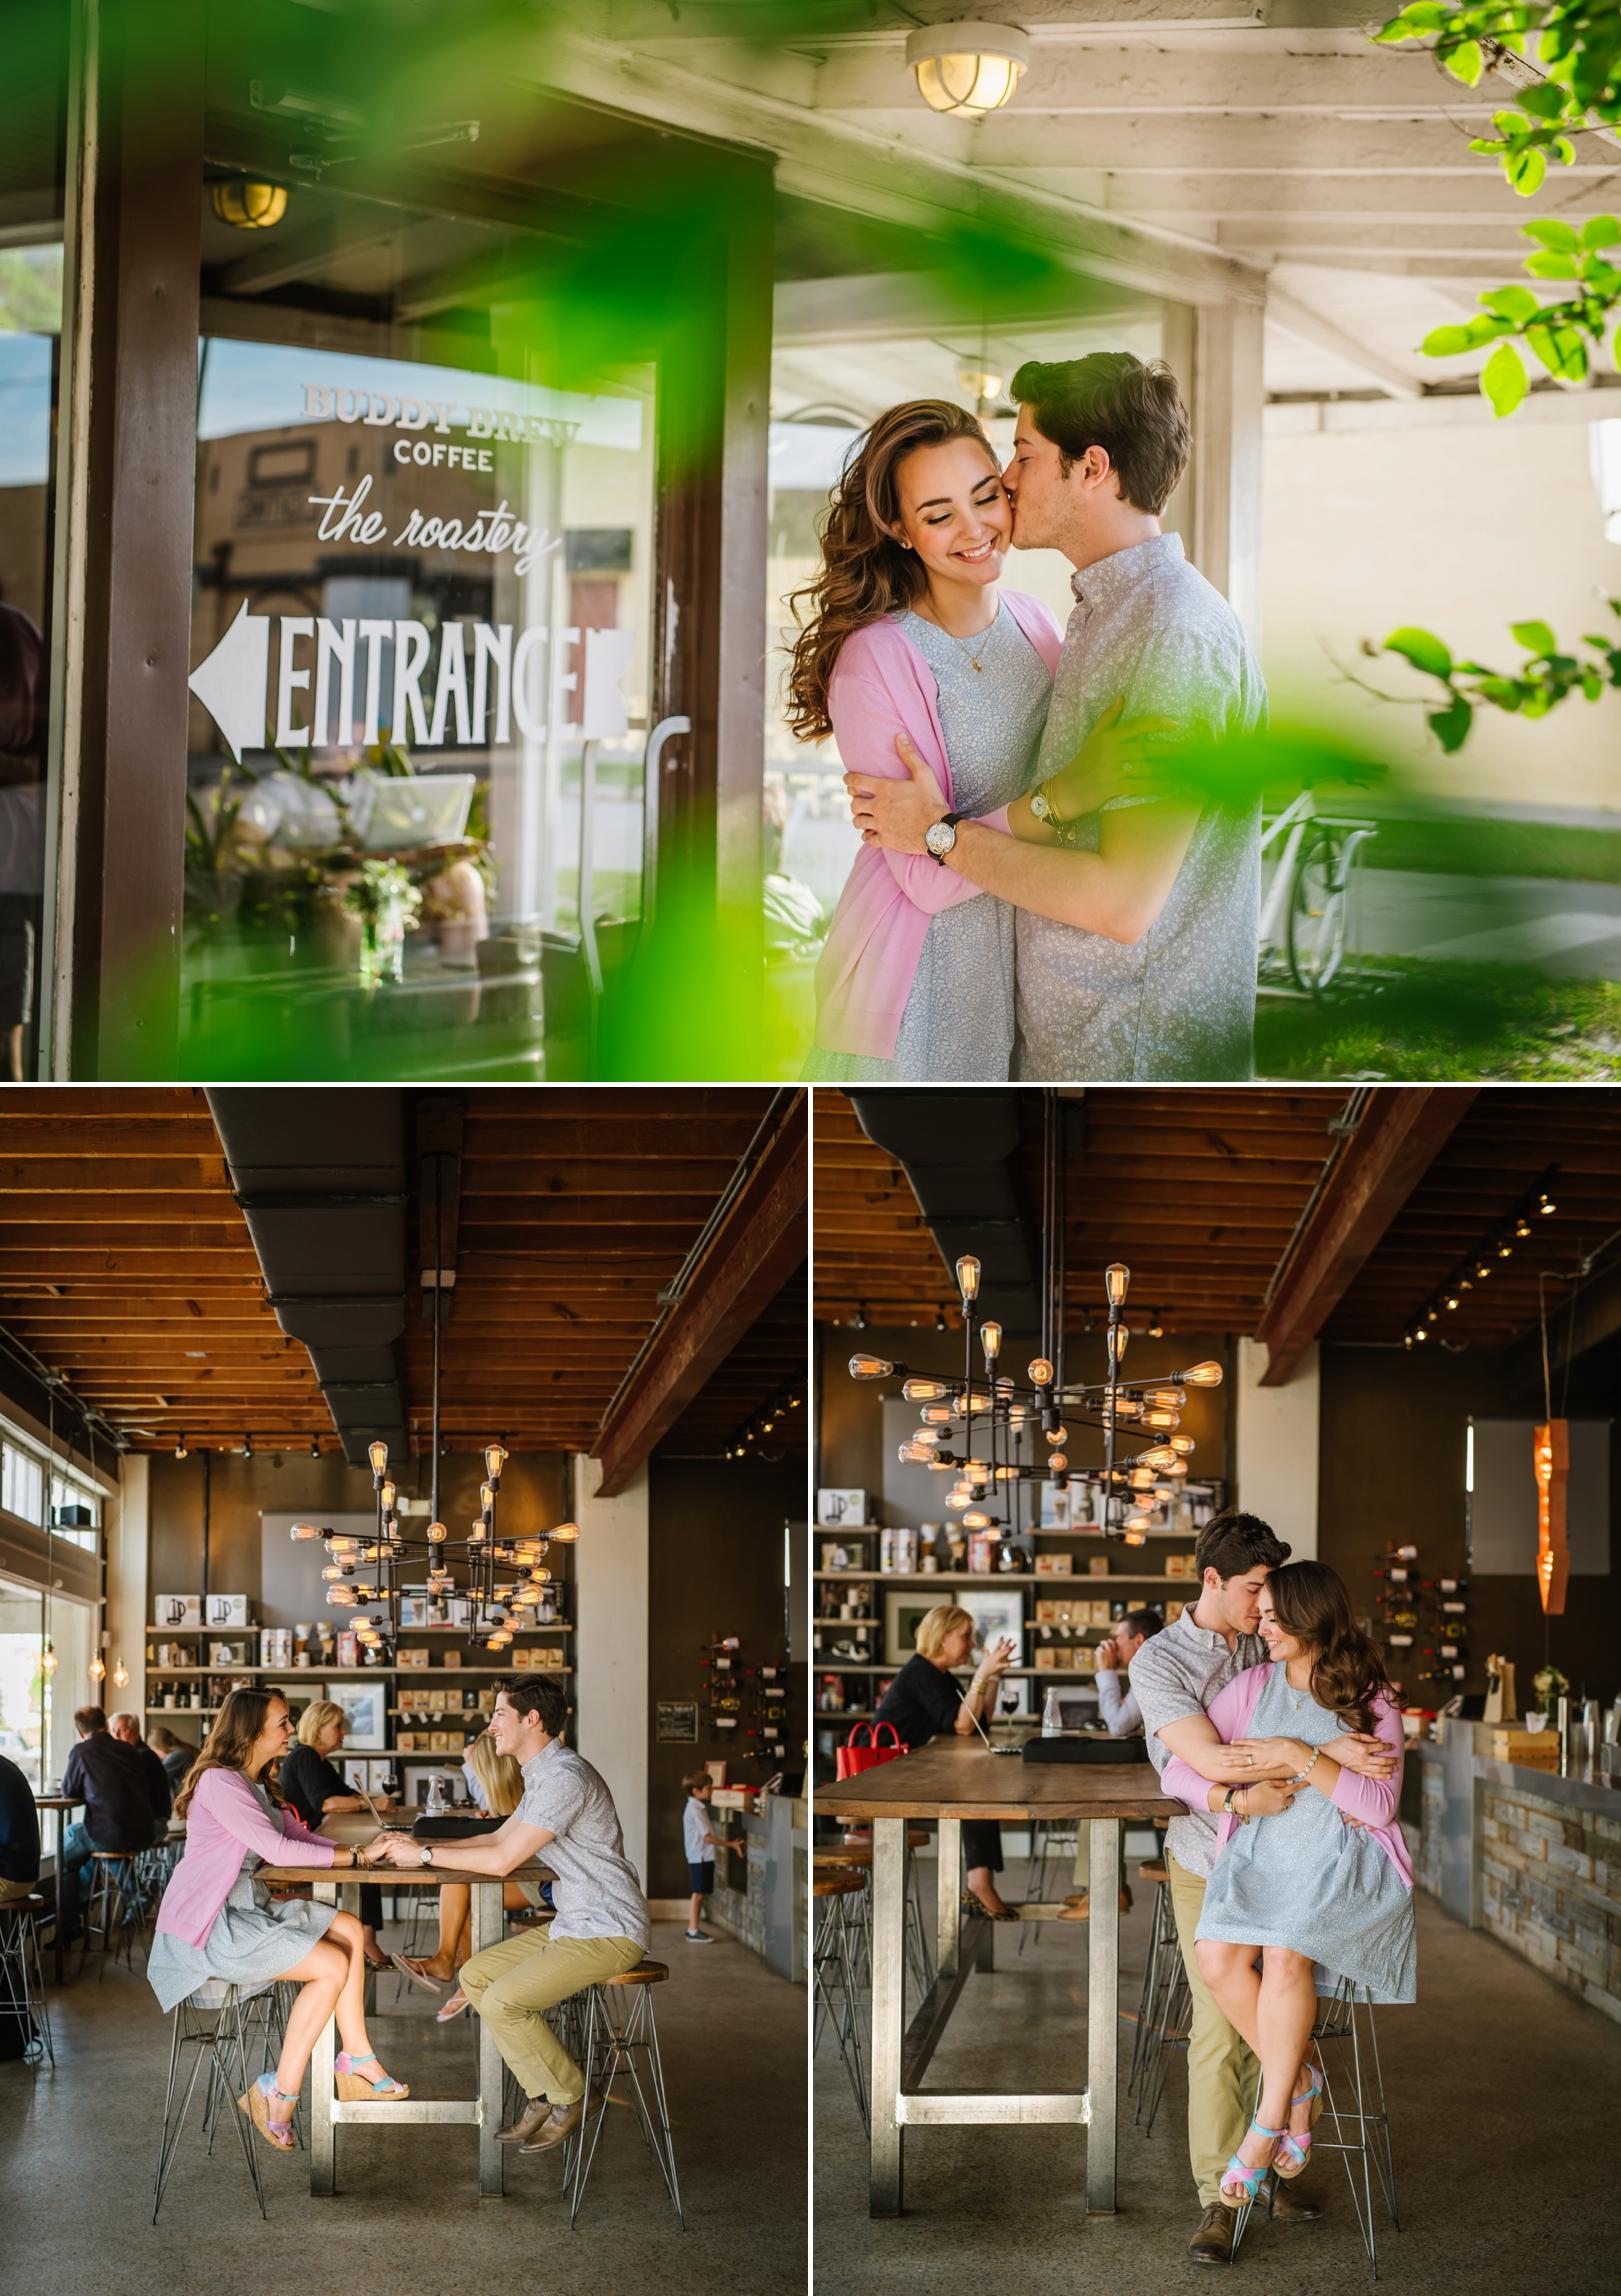 ashlee-hamon-photography-tampa-buddy-brew-coffee-shop-engagement_0004.jpg